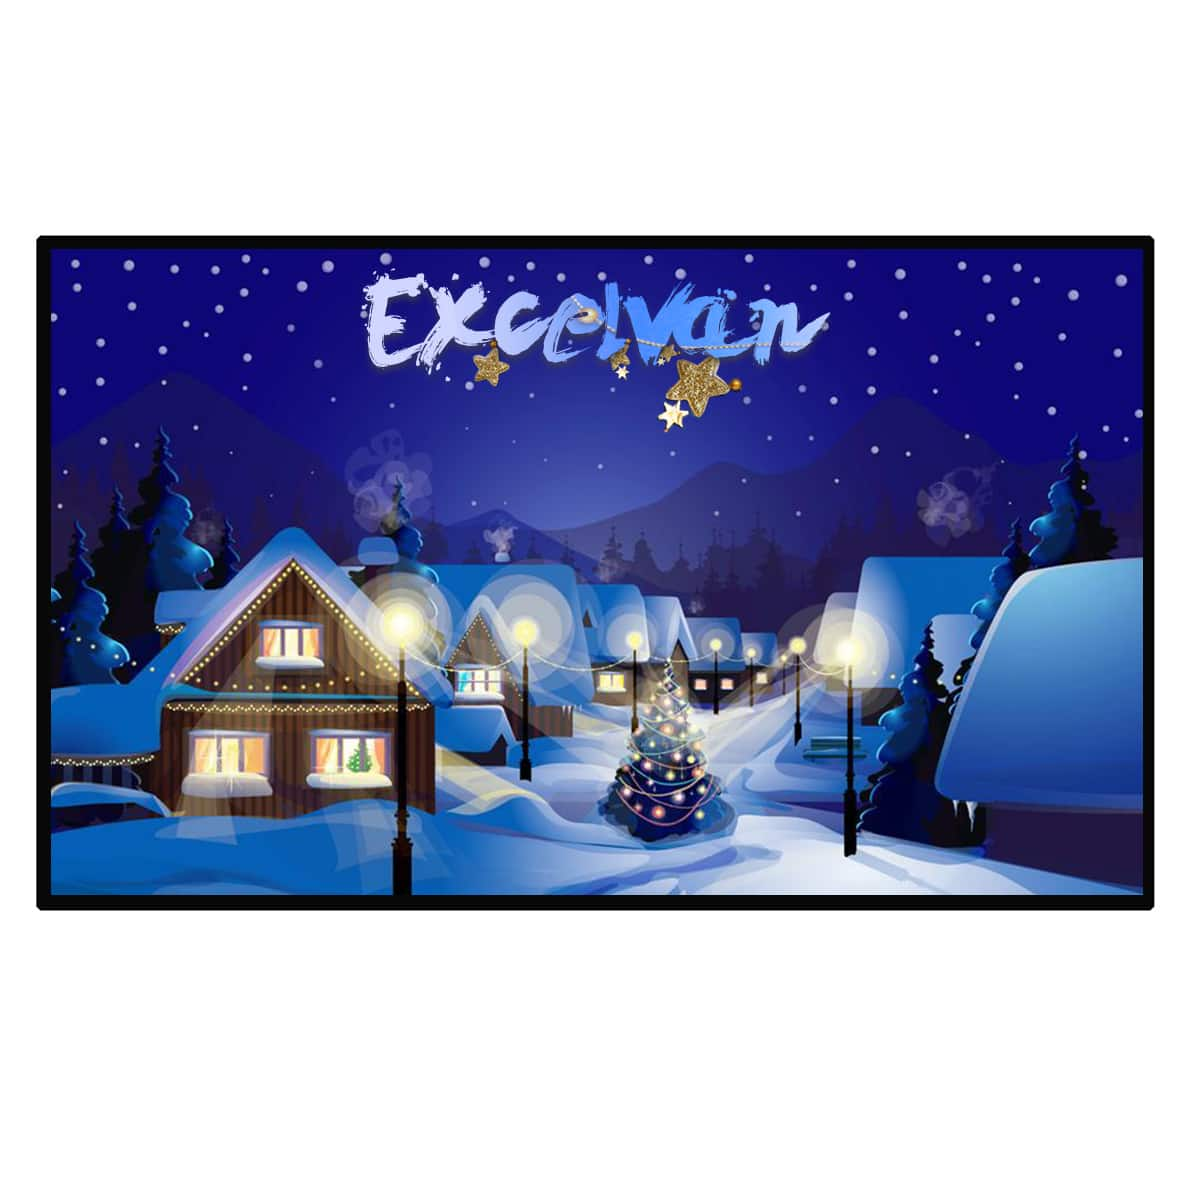 120 Inch 16:9 Portable Home Cinema Projector Screen PVC Fabric $27.99 @ Amazon